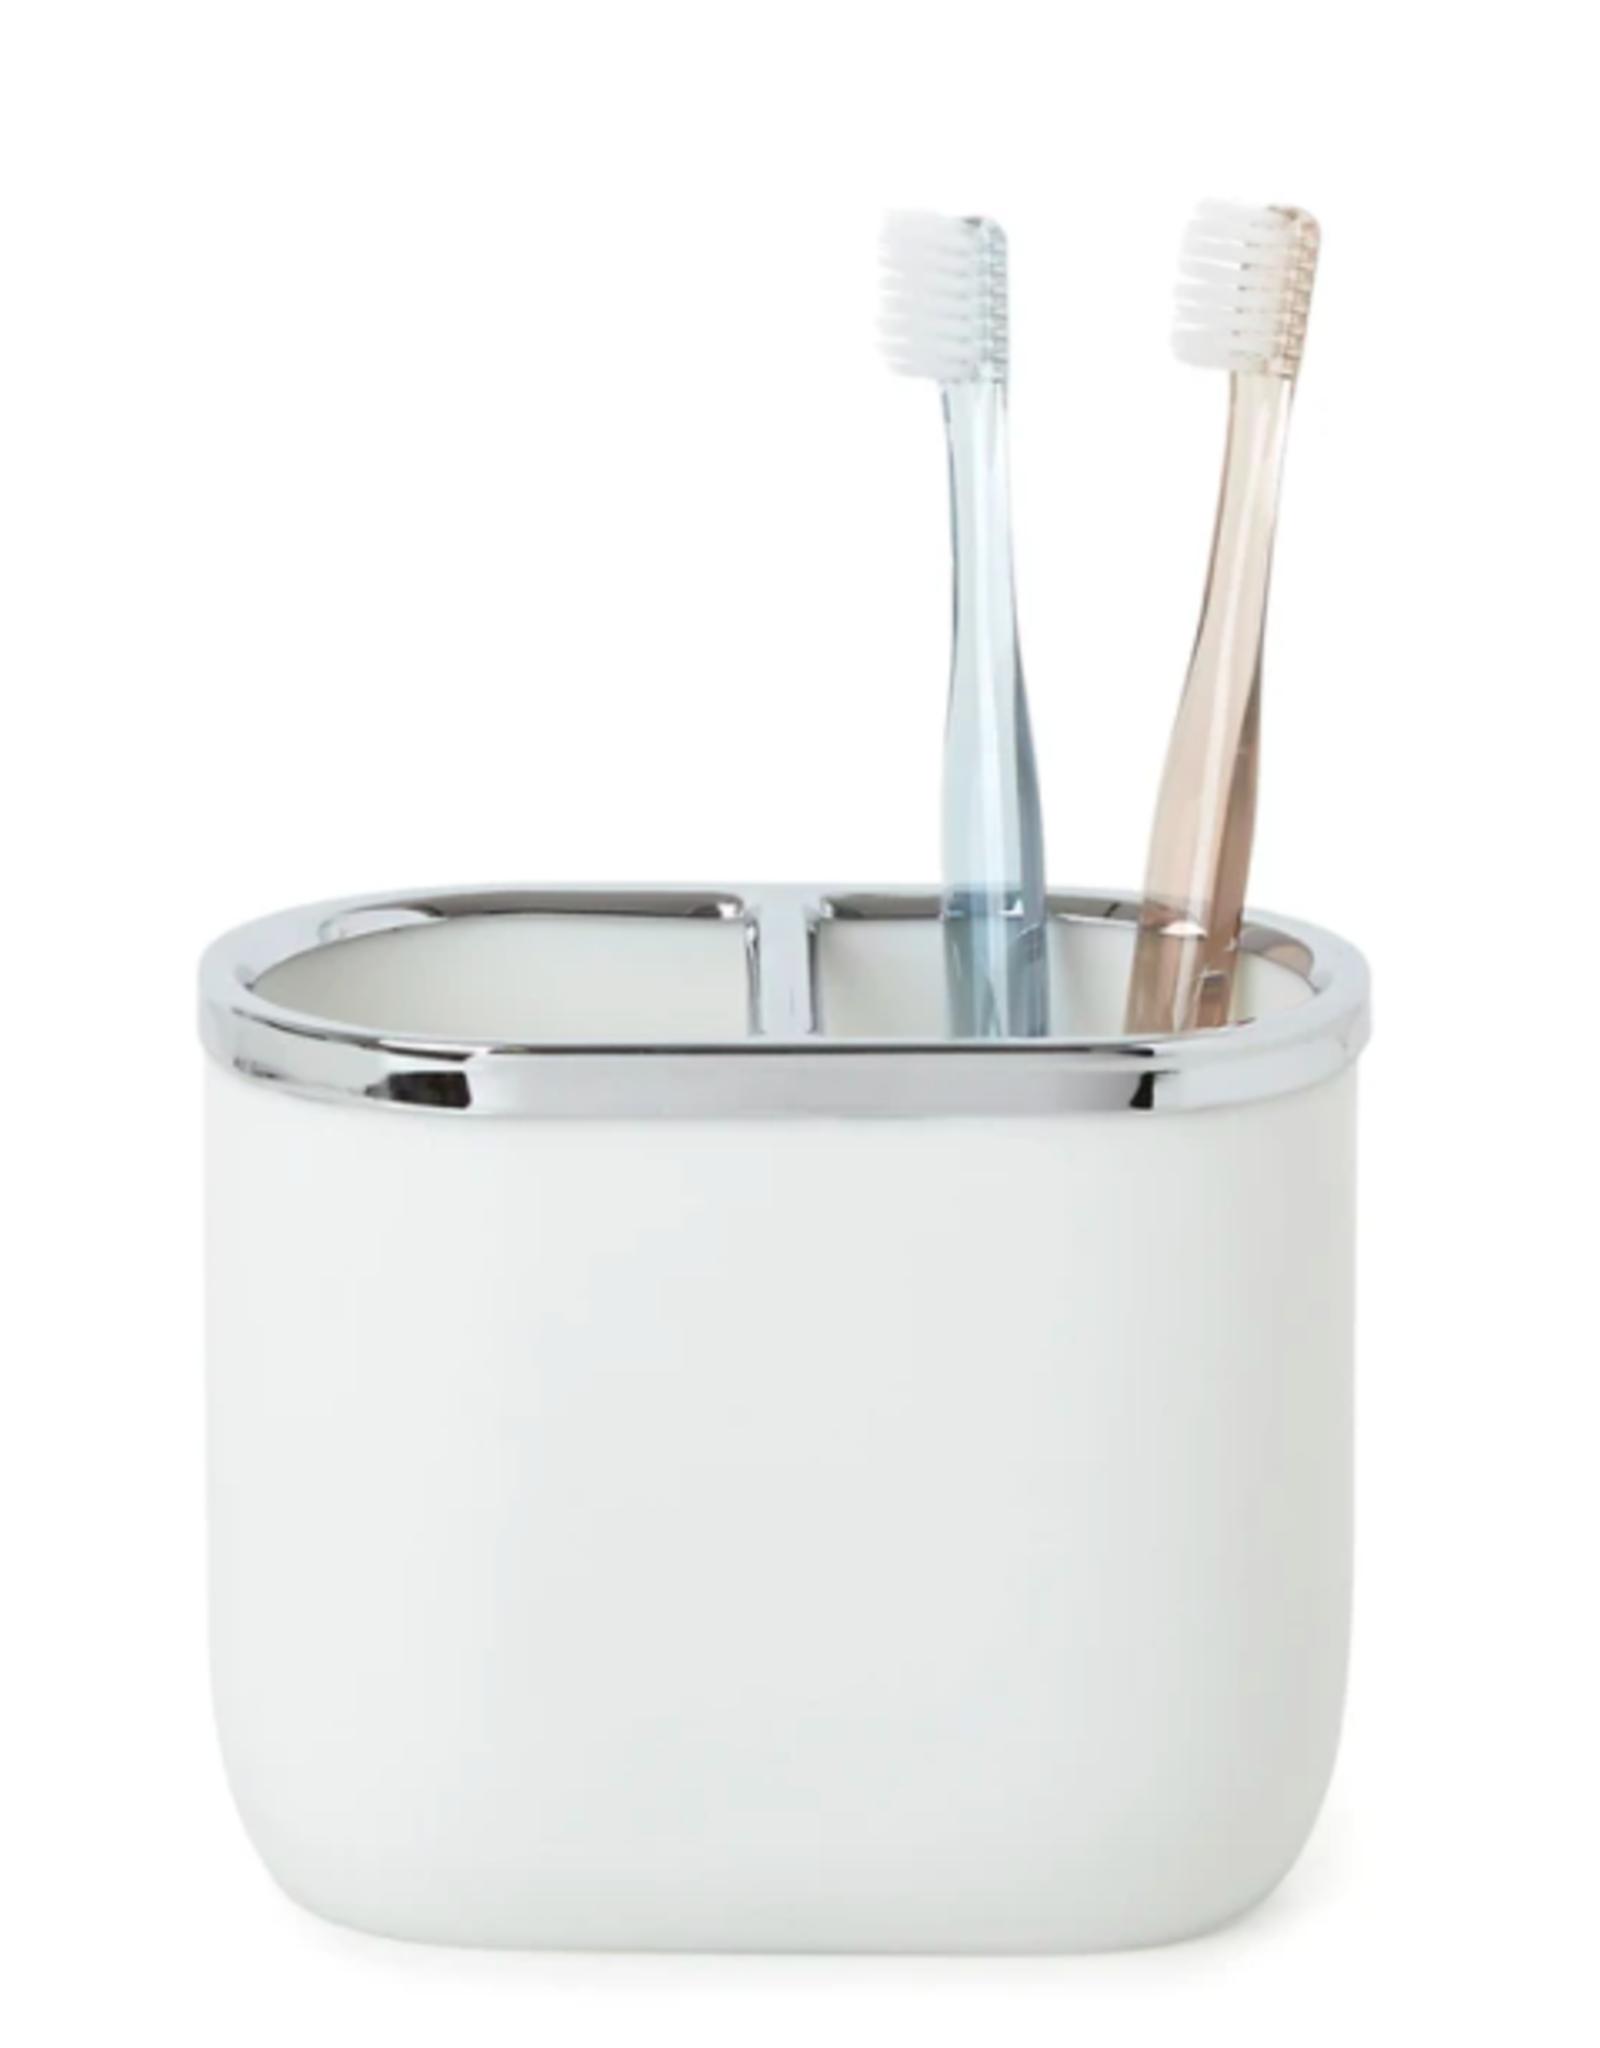 Umbra Umbra Junip Toothbrush Holder